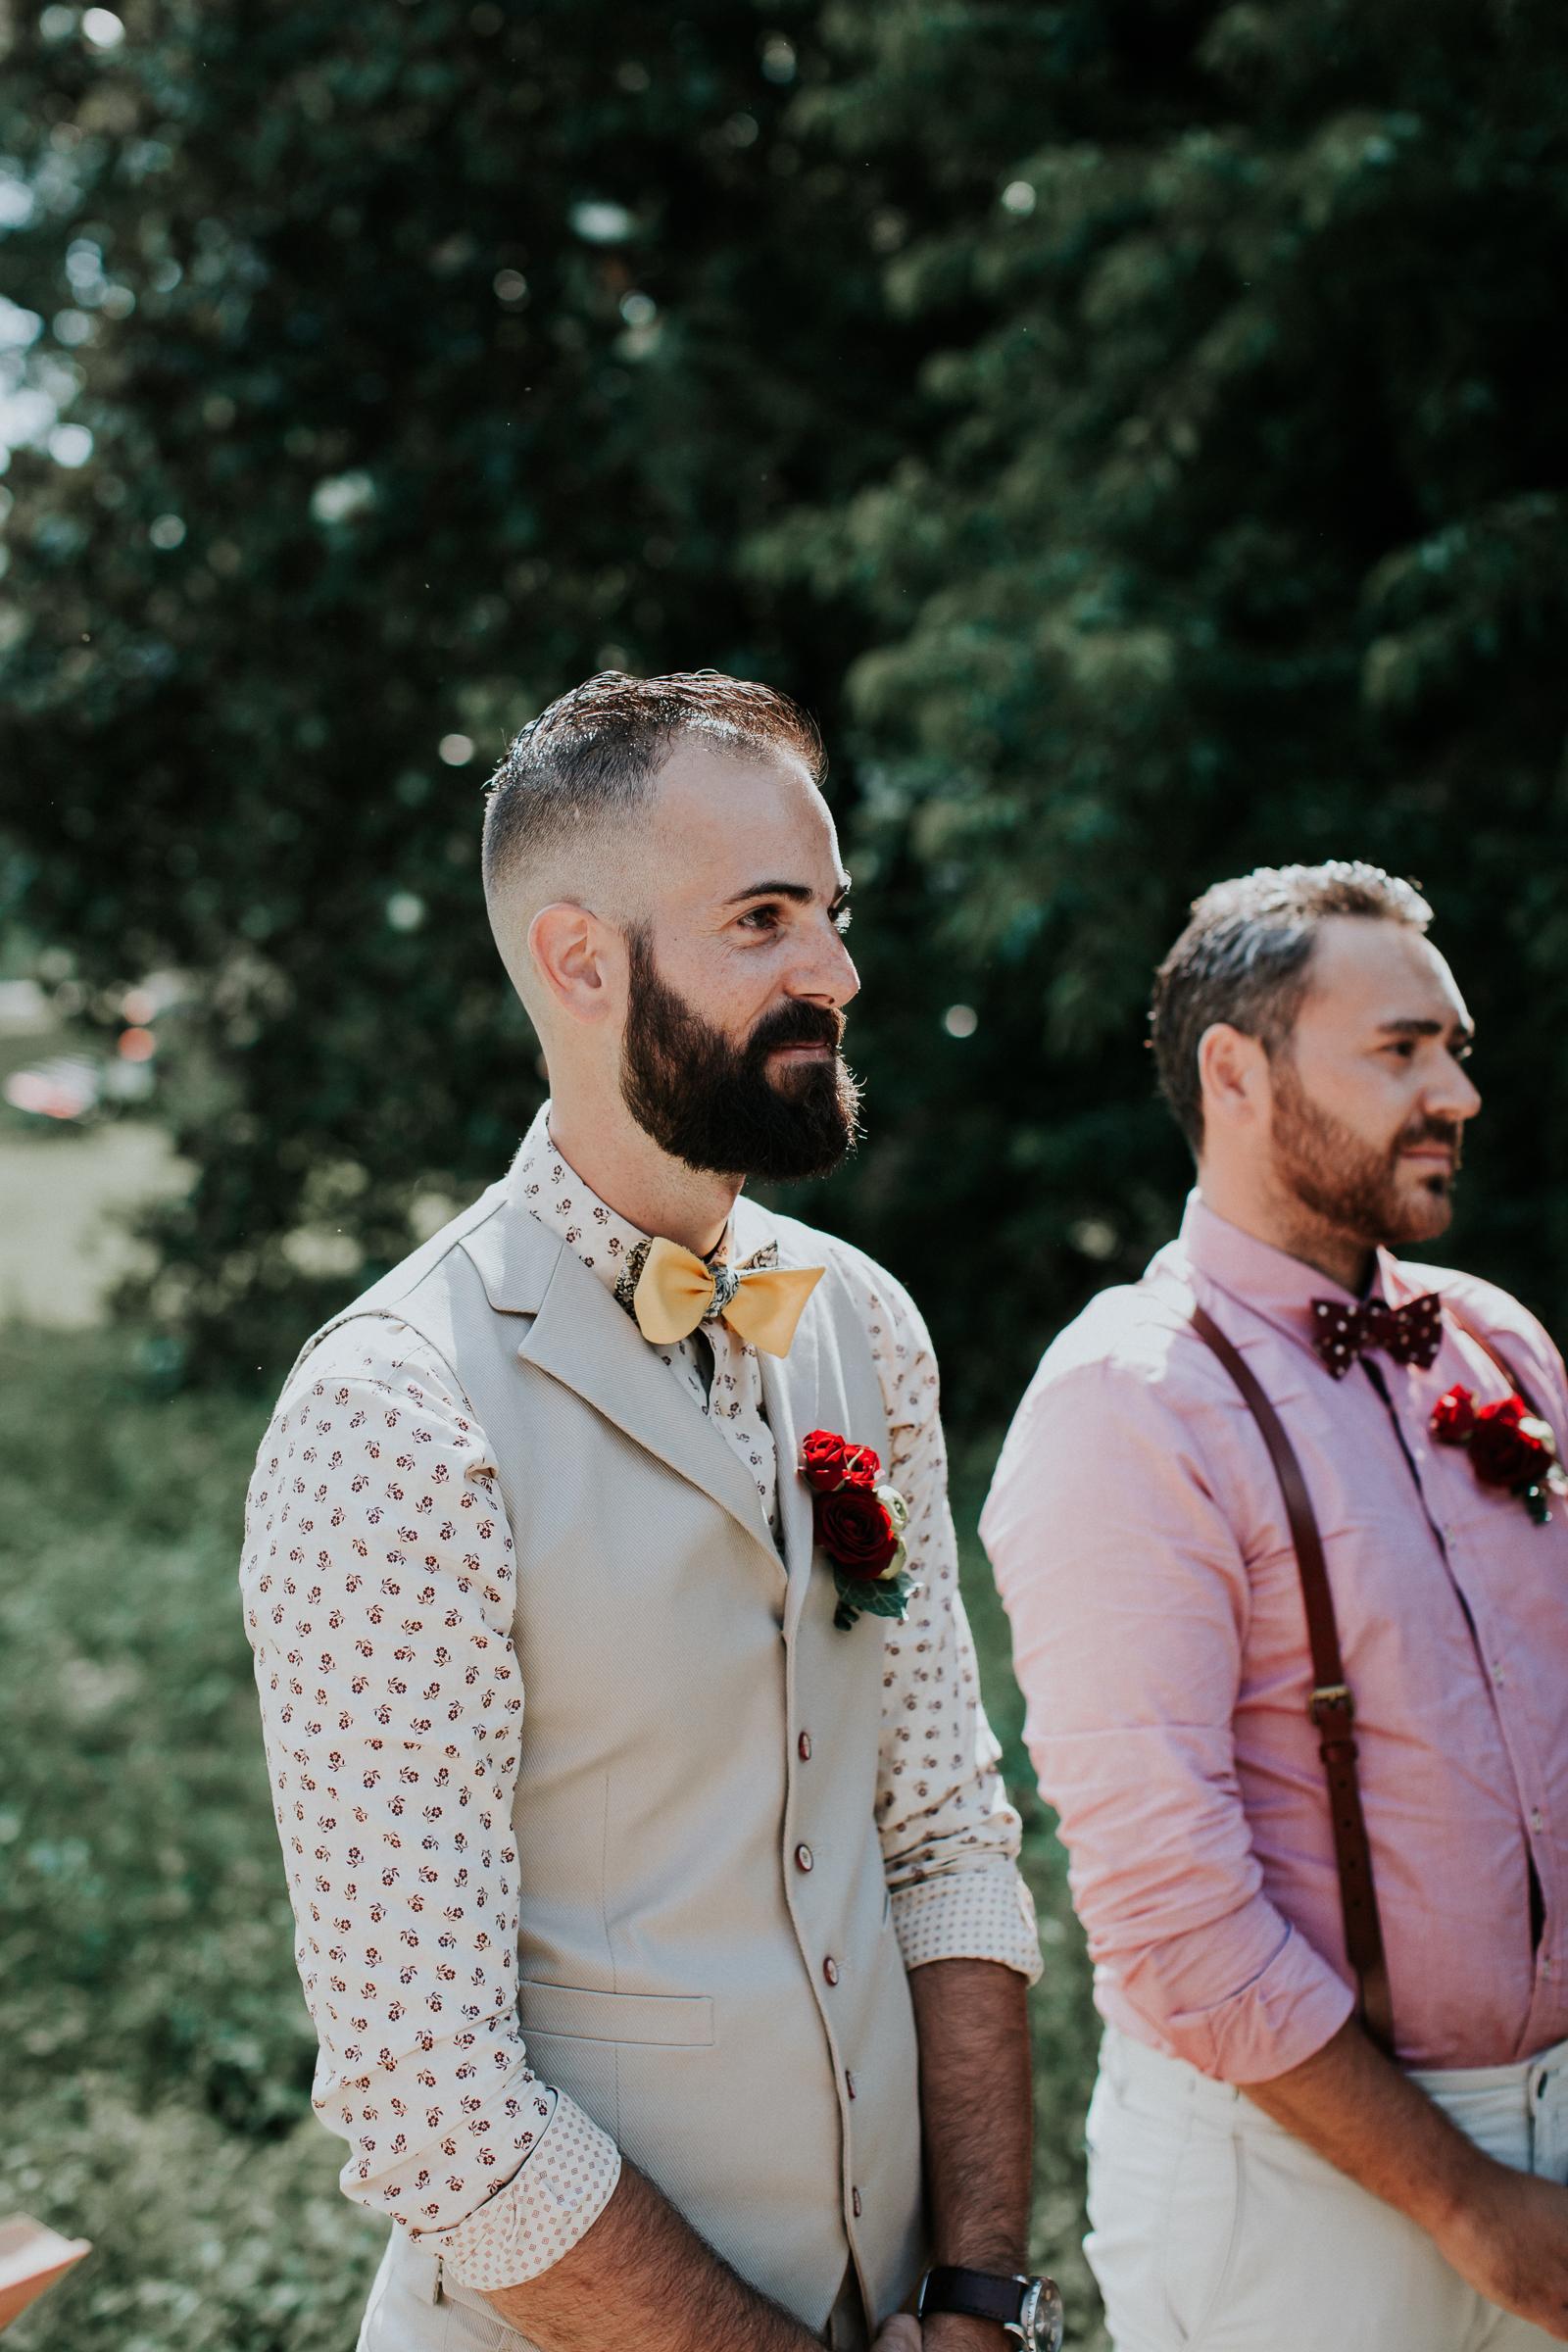 Backyard-Intimate-Adventurous-Destination-Wedding-Darien-Connecticut-Documentary-Wedding-Photography-54.jpg